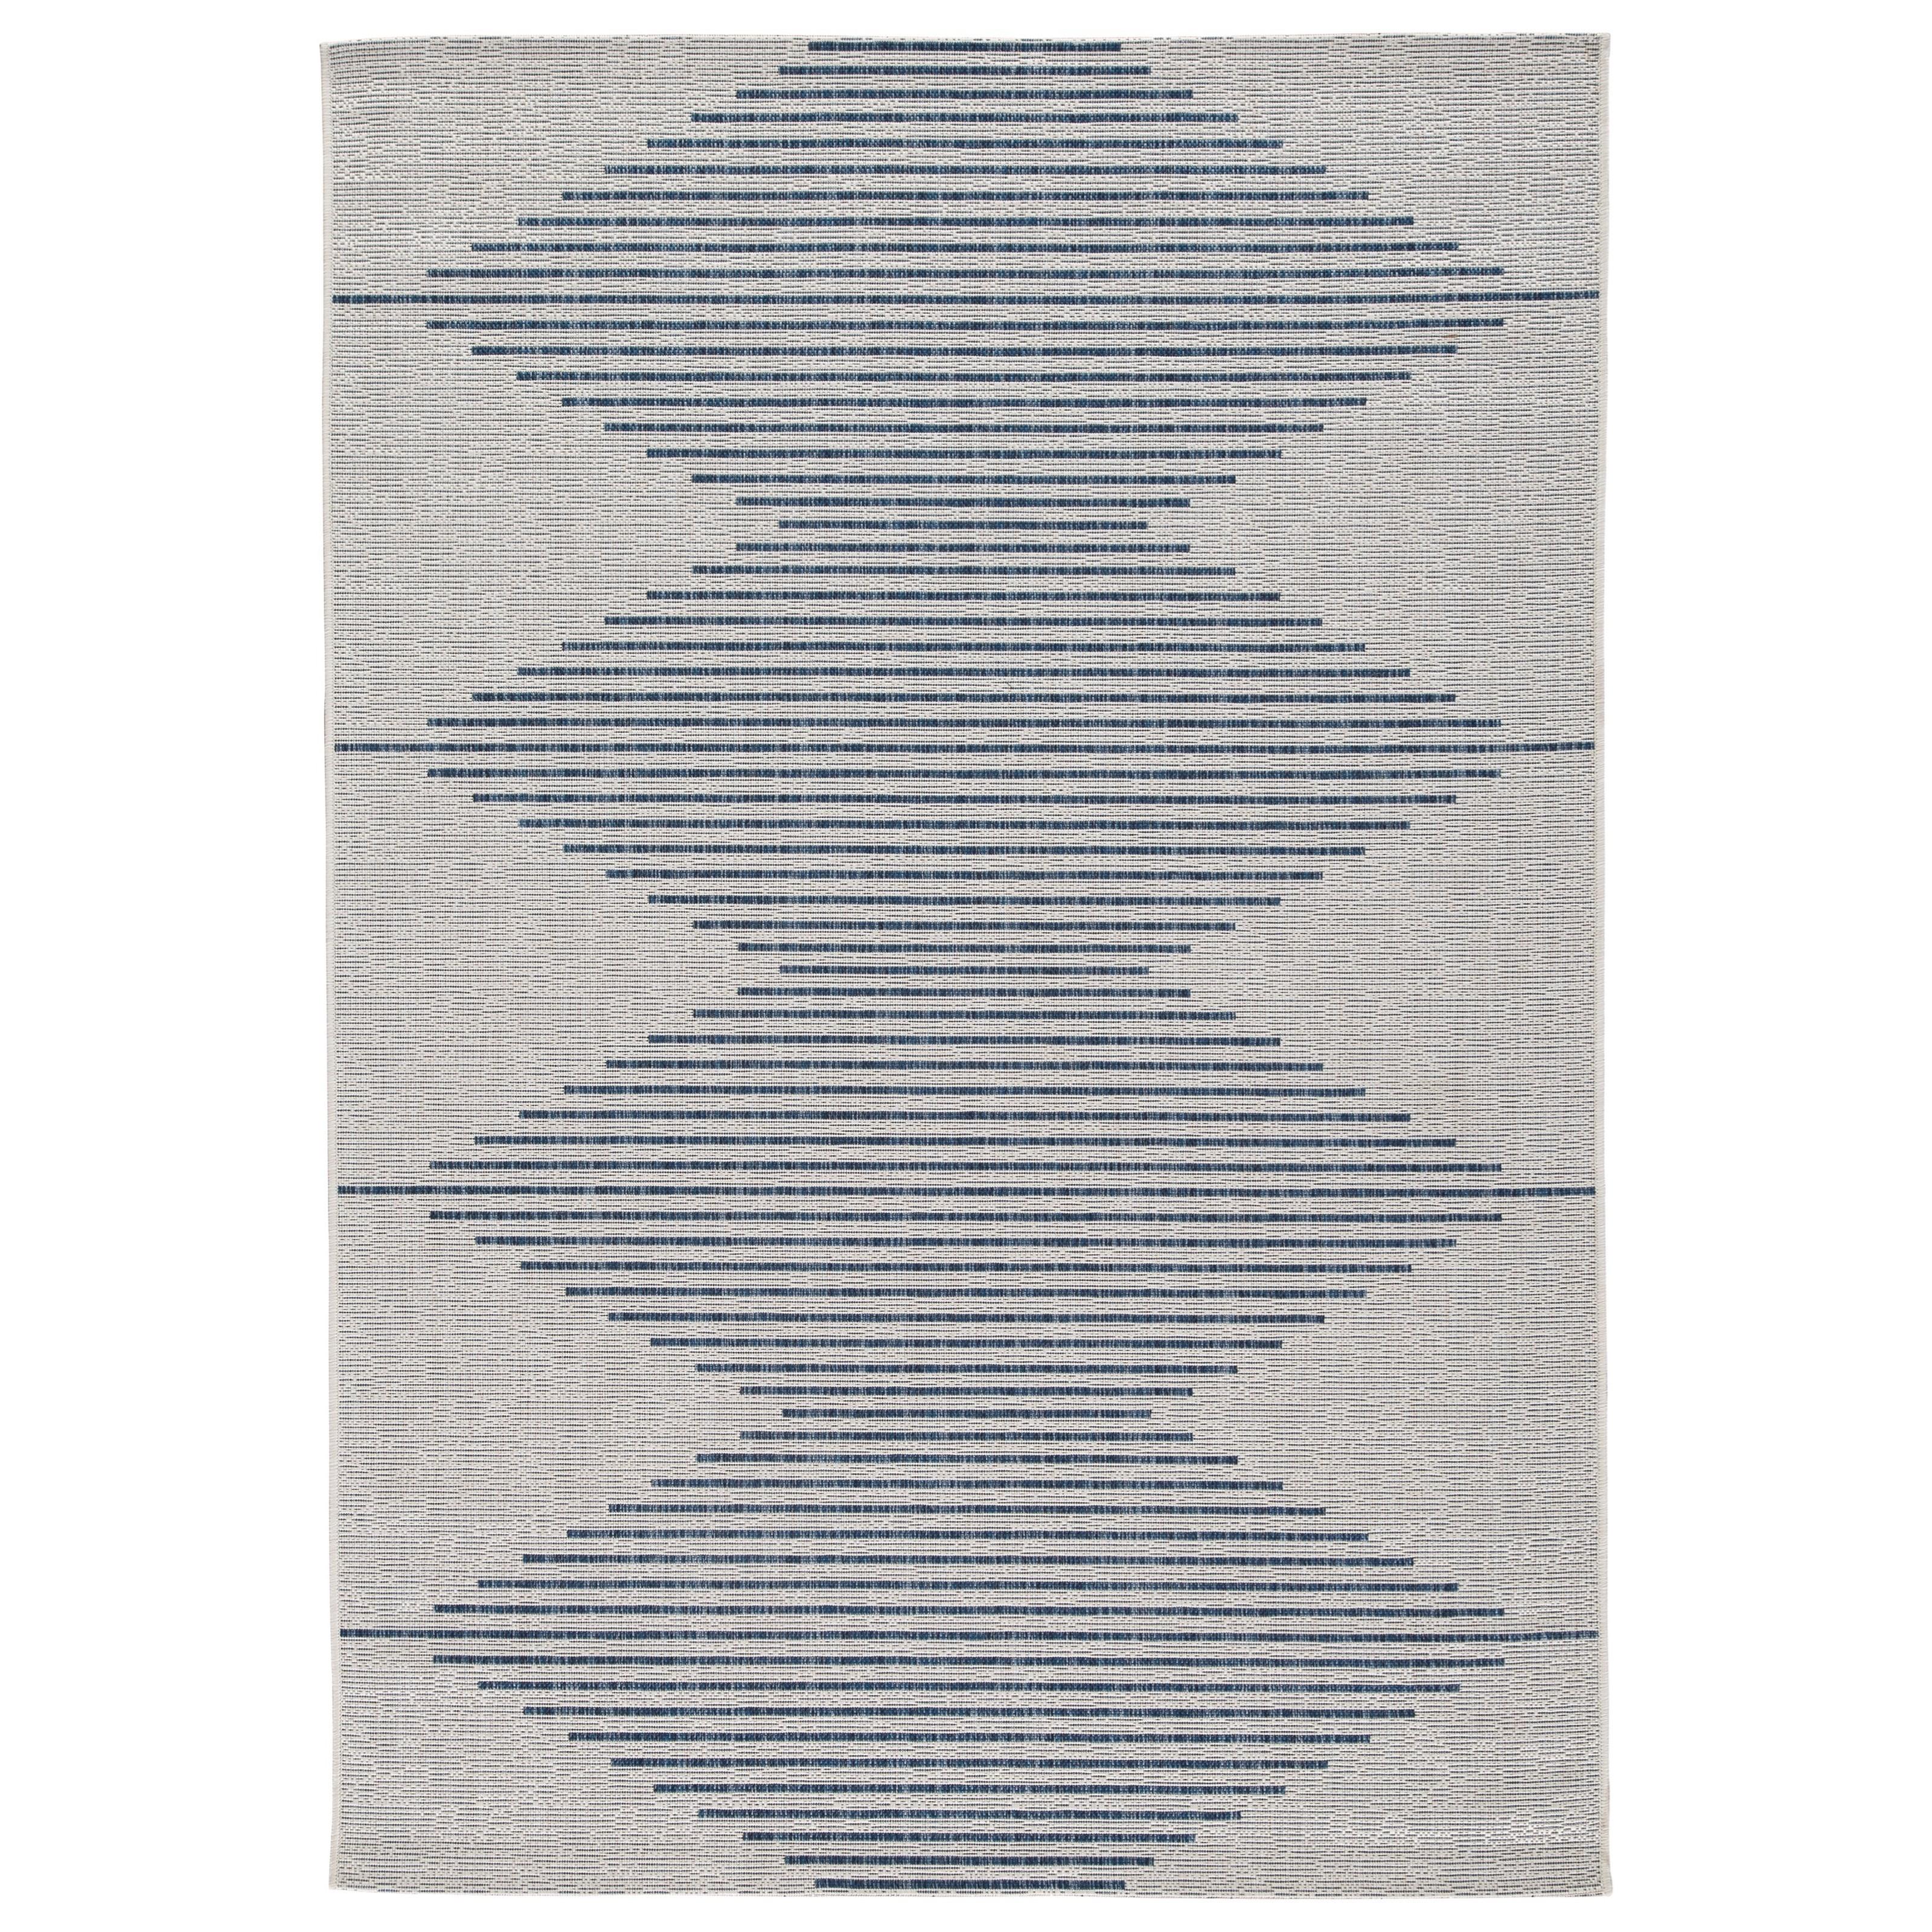 Contemporary Area Rugs Alverno Indoor/Outdoor Medium Rug by Signature Design by Ashley at Smart Buy Furniture